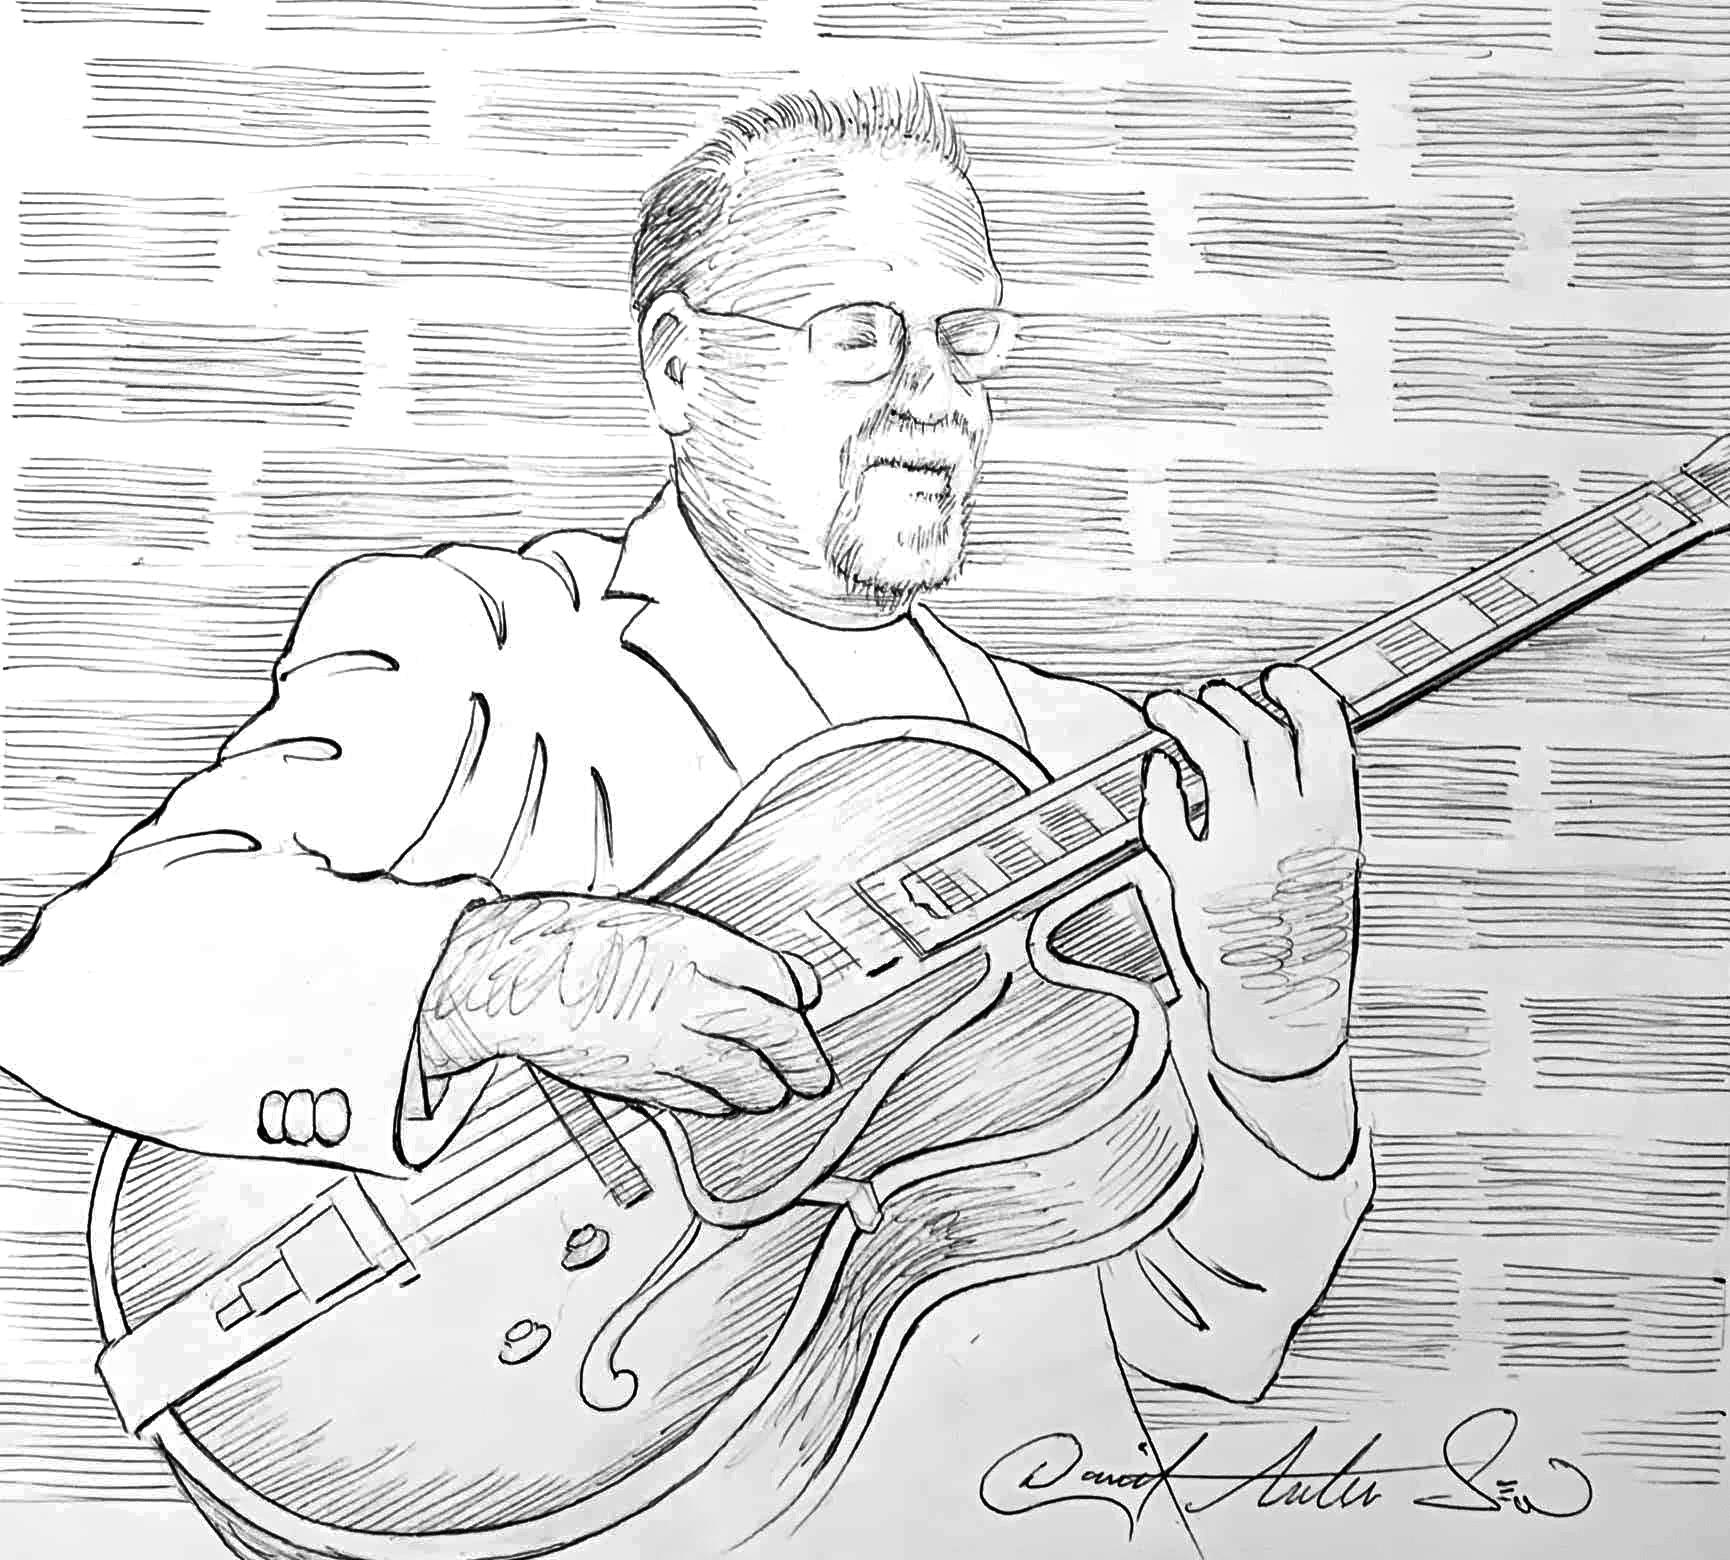 Marty Crum by David Andersen